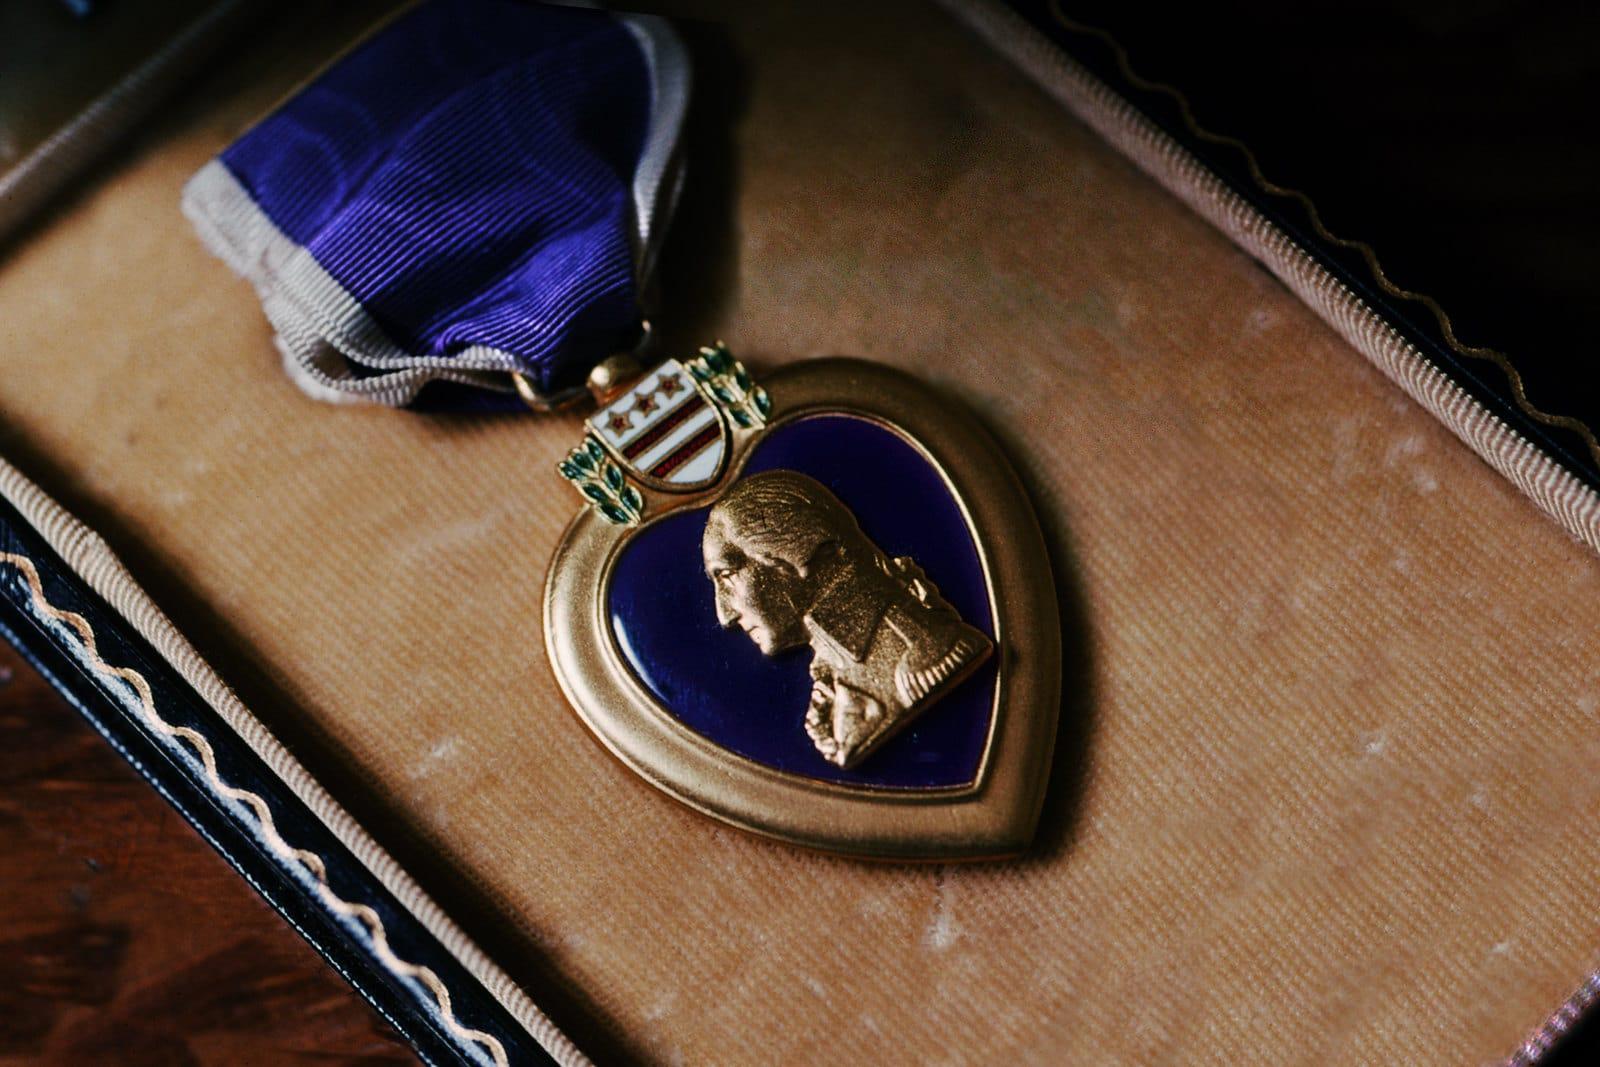 Illinois man receives medals from World War II and Korean War